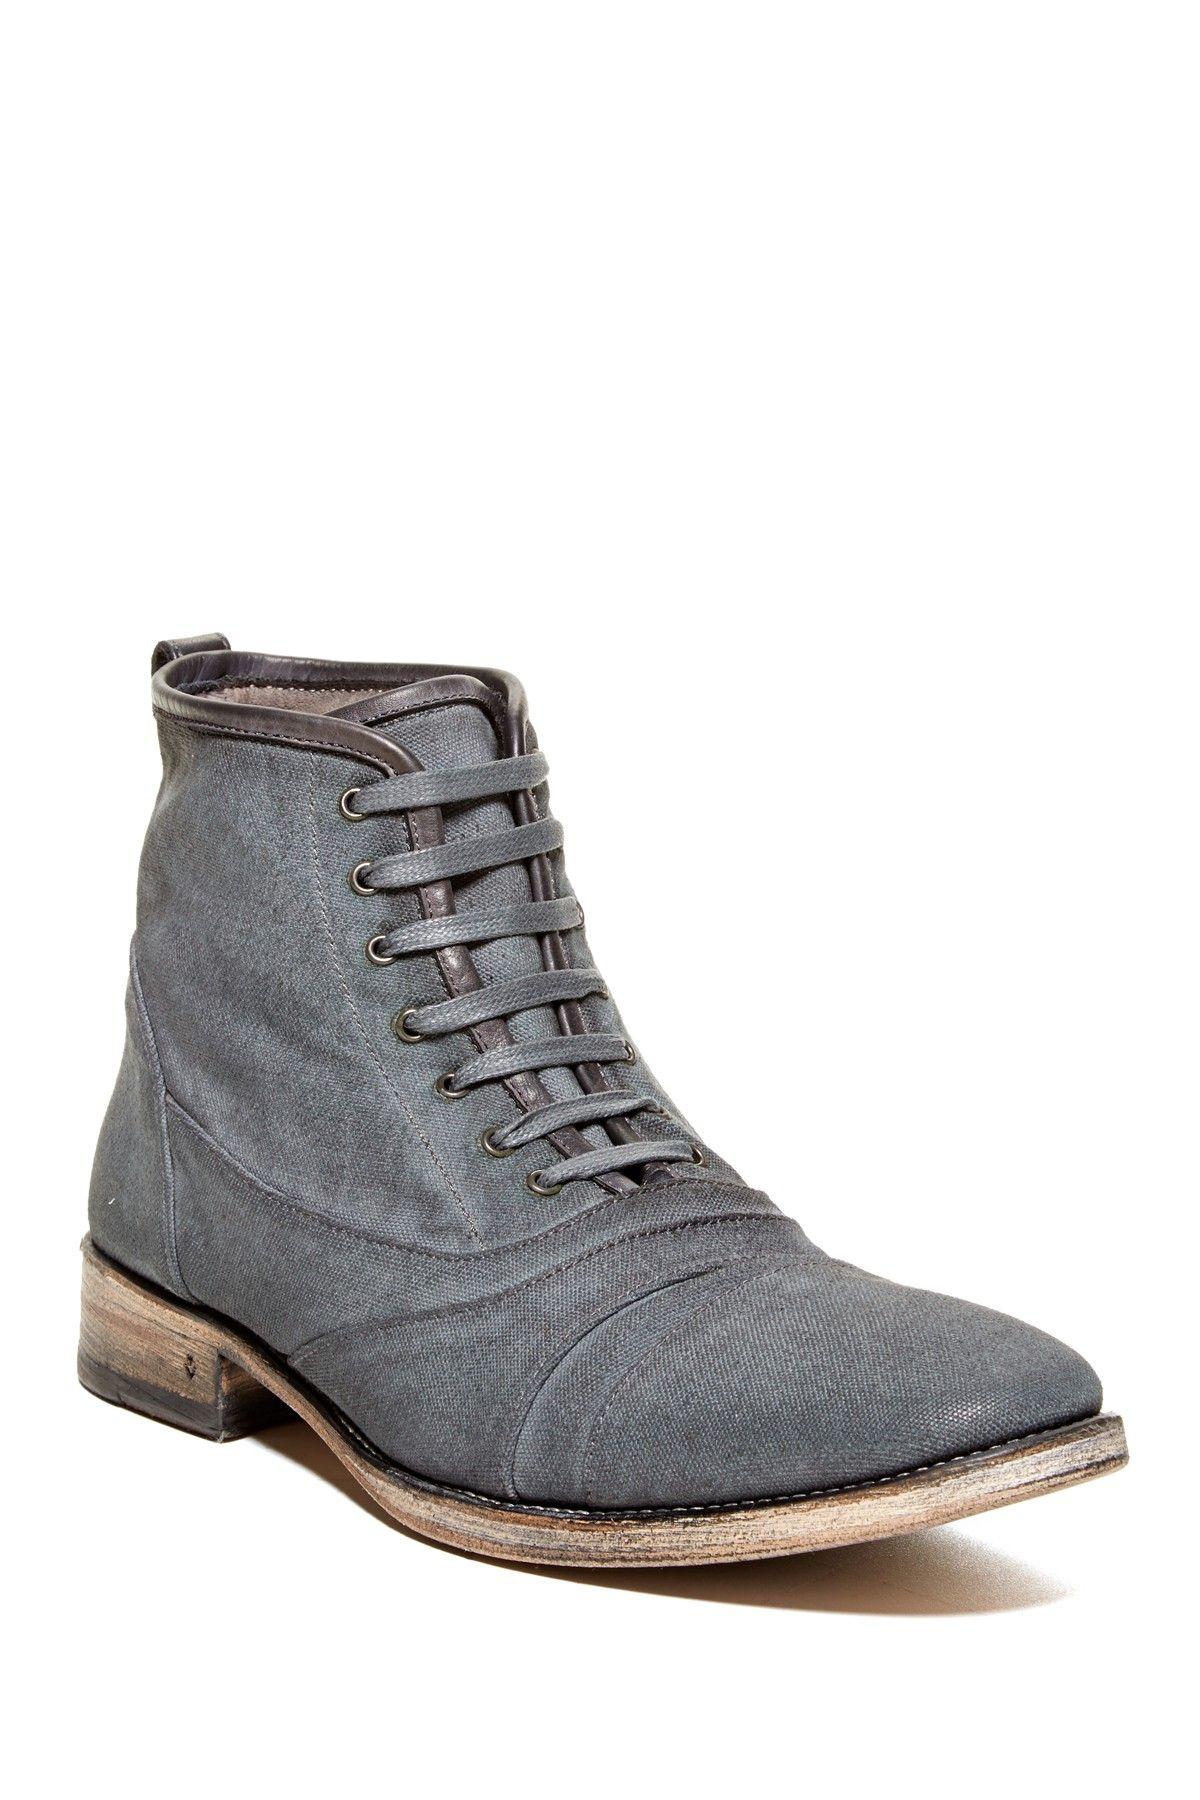 John Varvatos Fleetwood Lace-Up Boot by John Varvatos on @nordstrom_rack